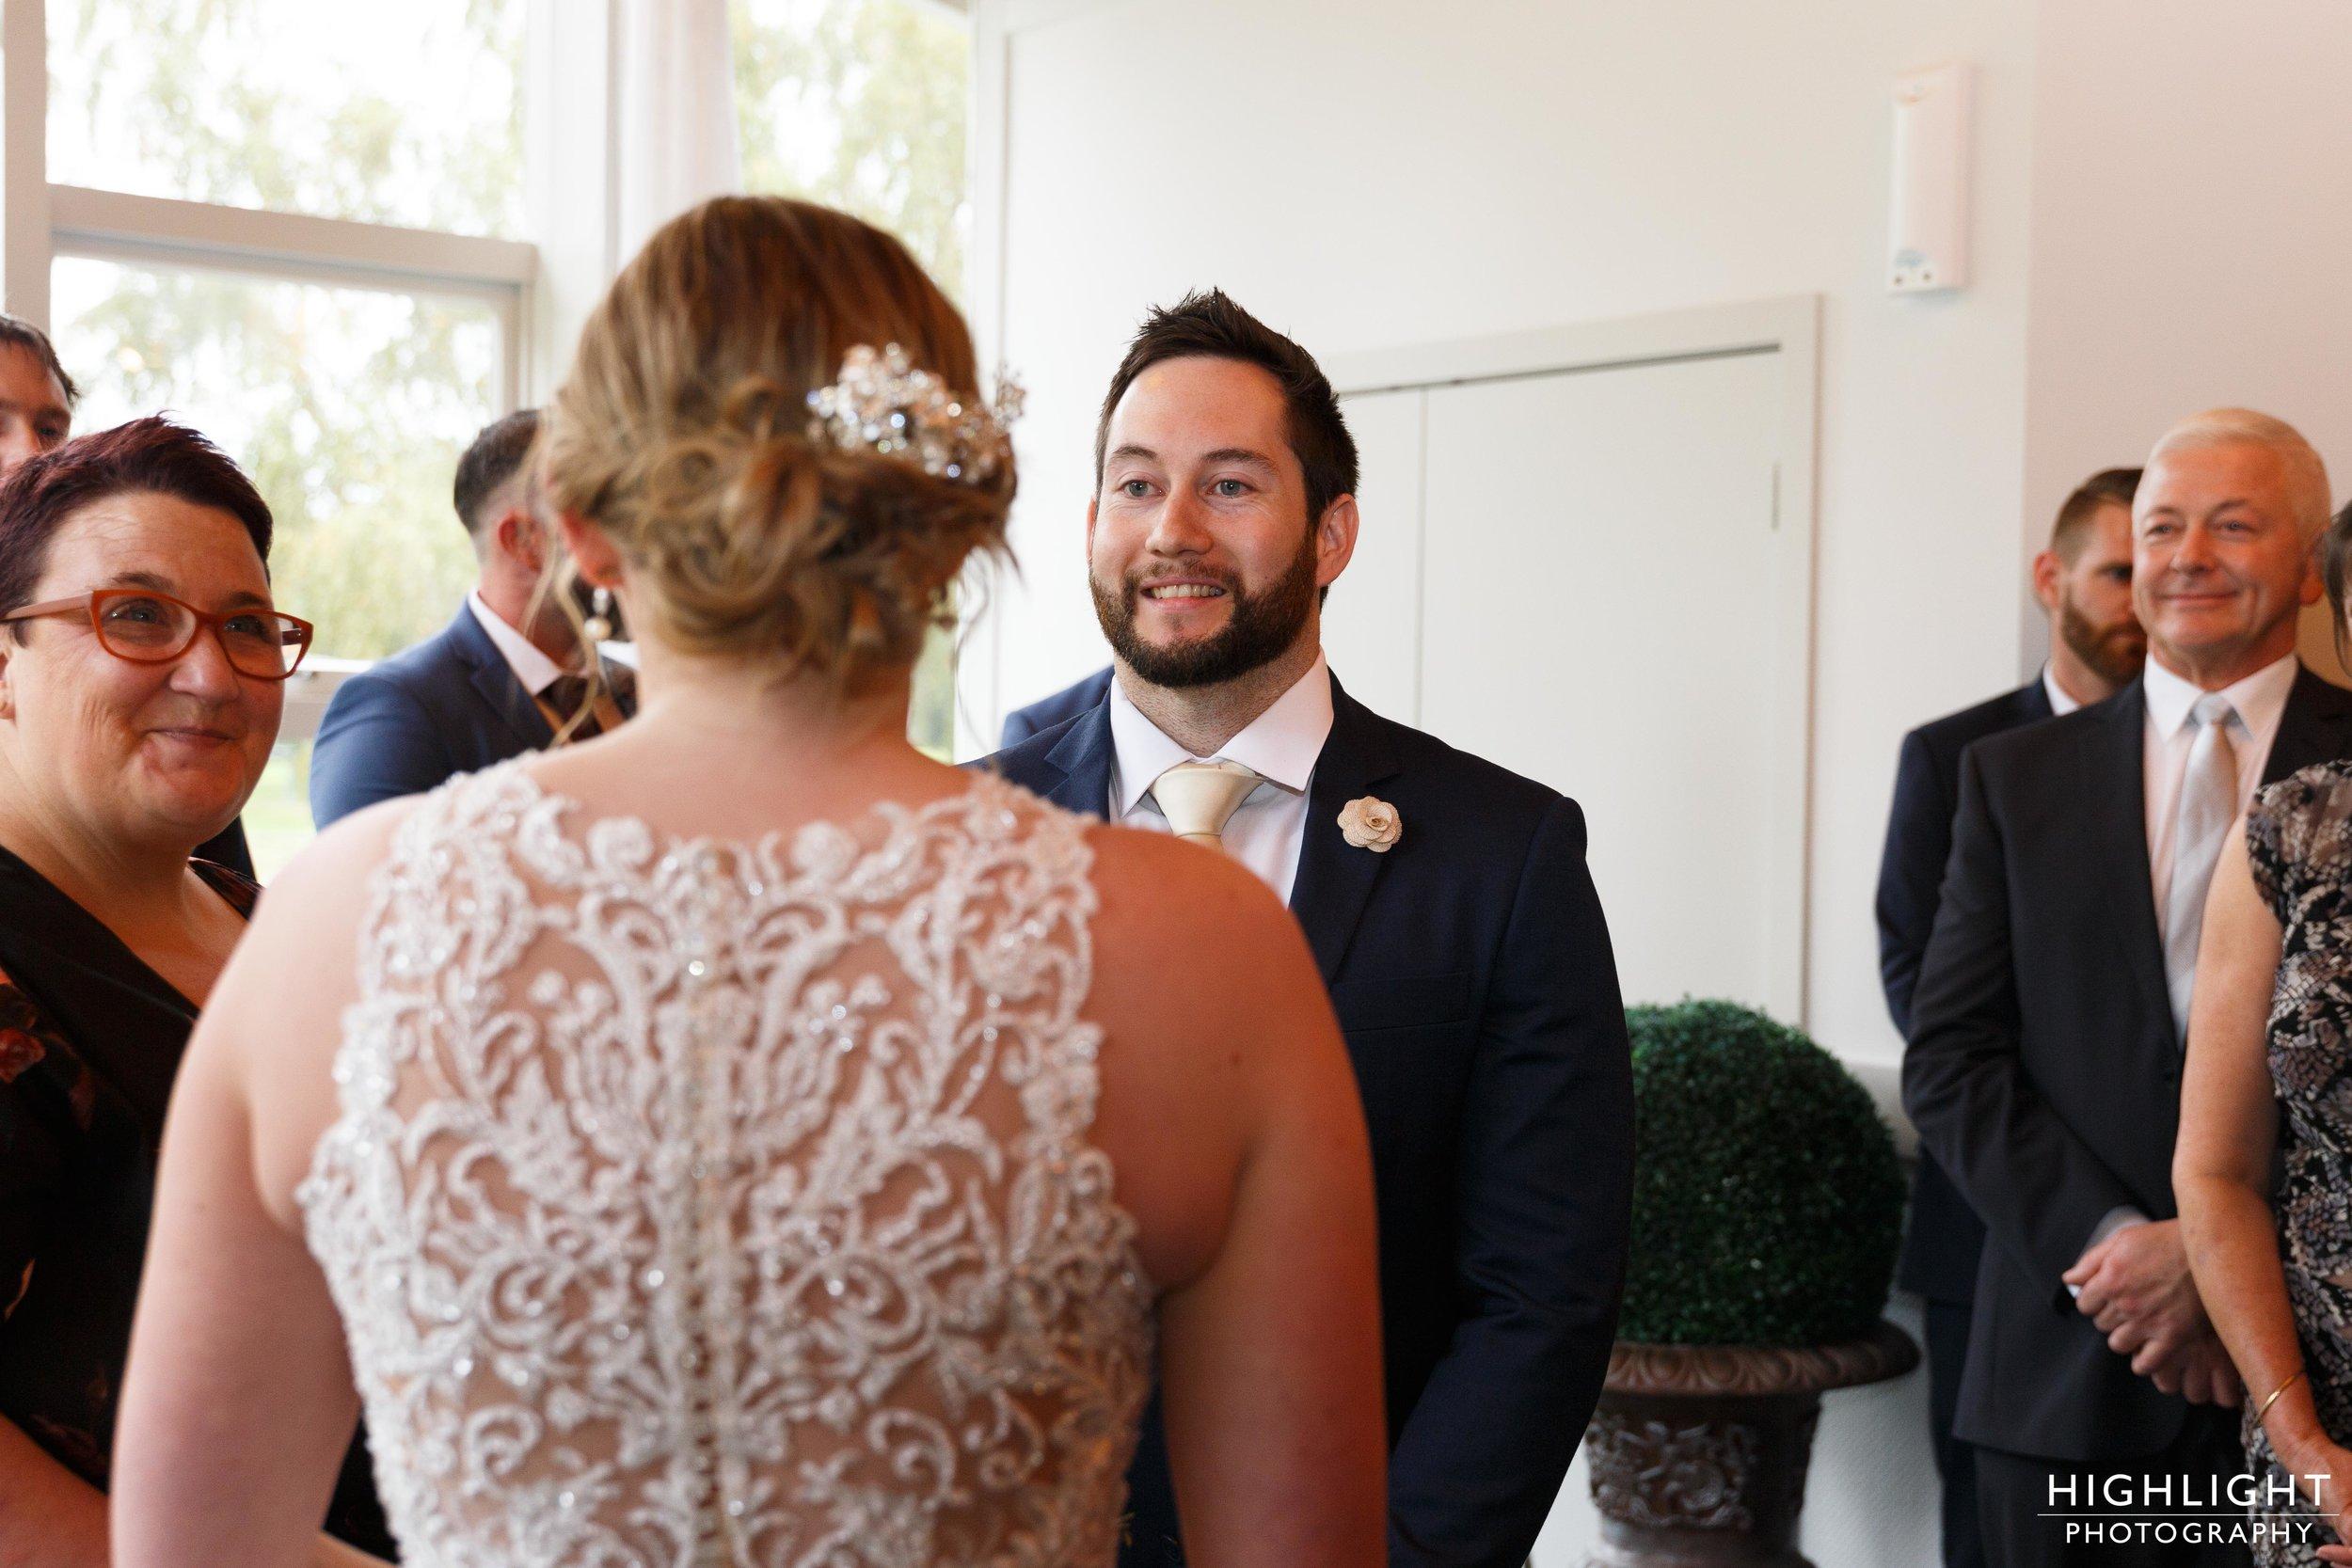 highlight-wedding-photography-palmerston-north-new-zealand-manawatu-chalet-42.jpg